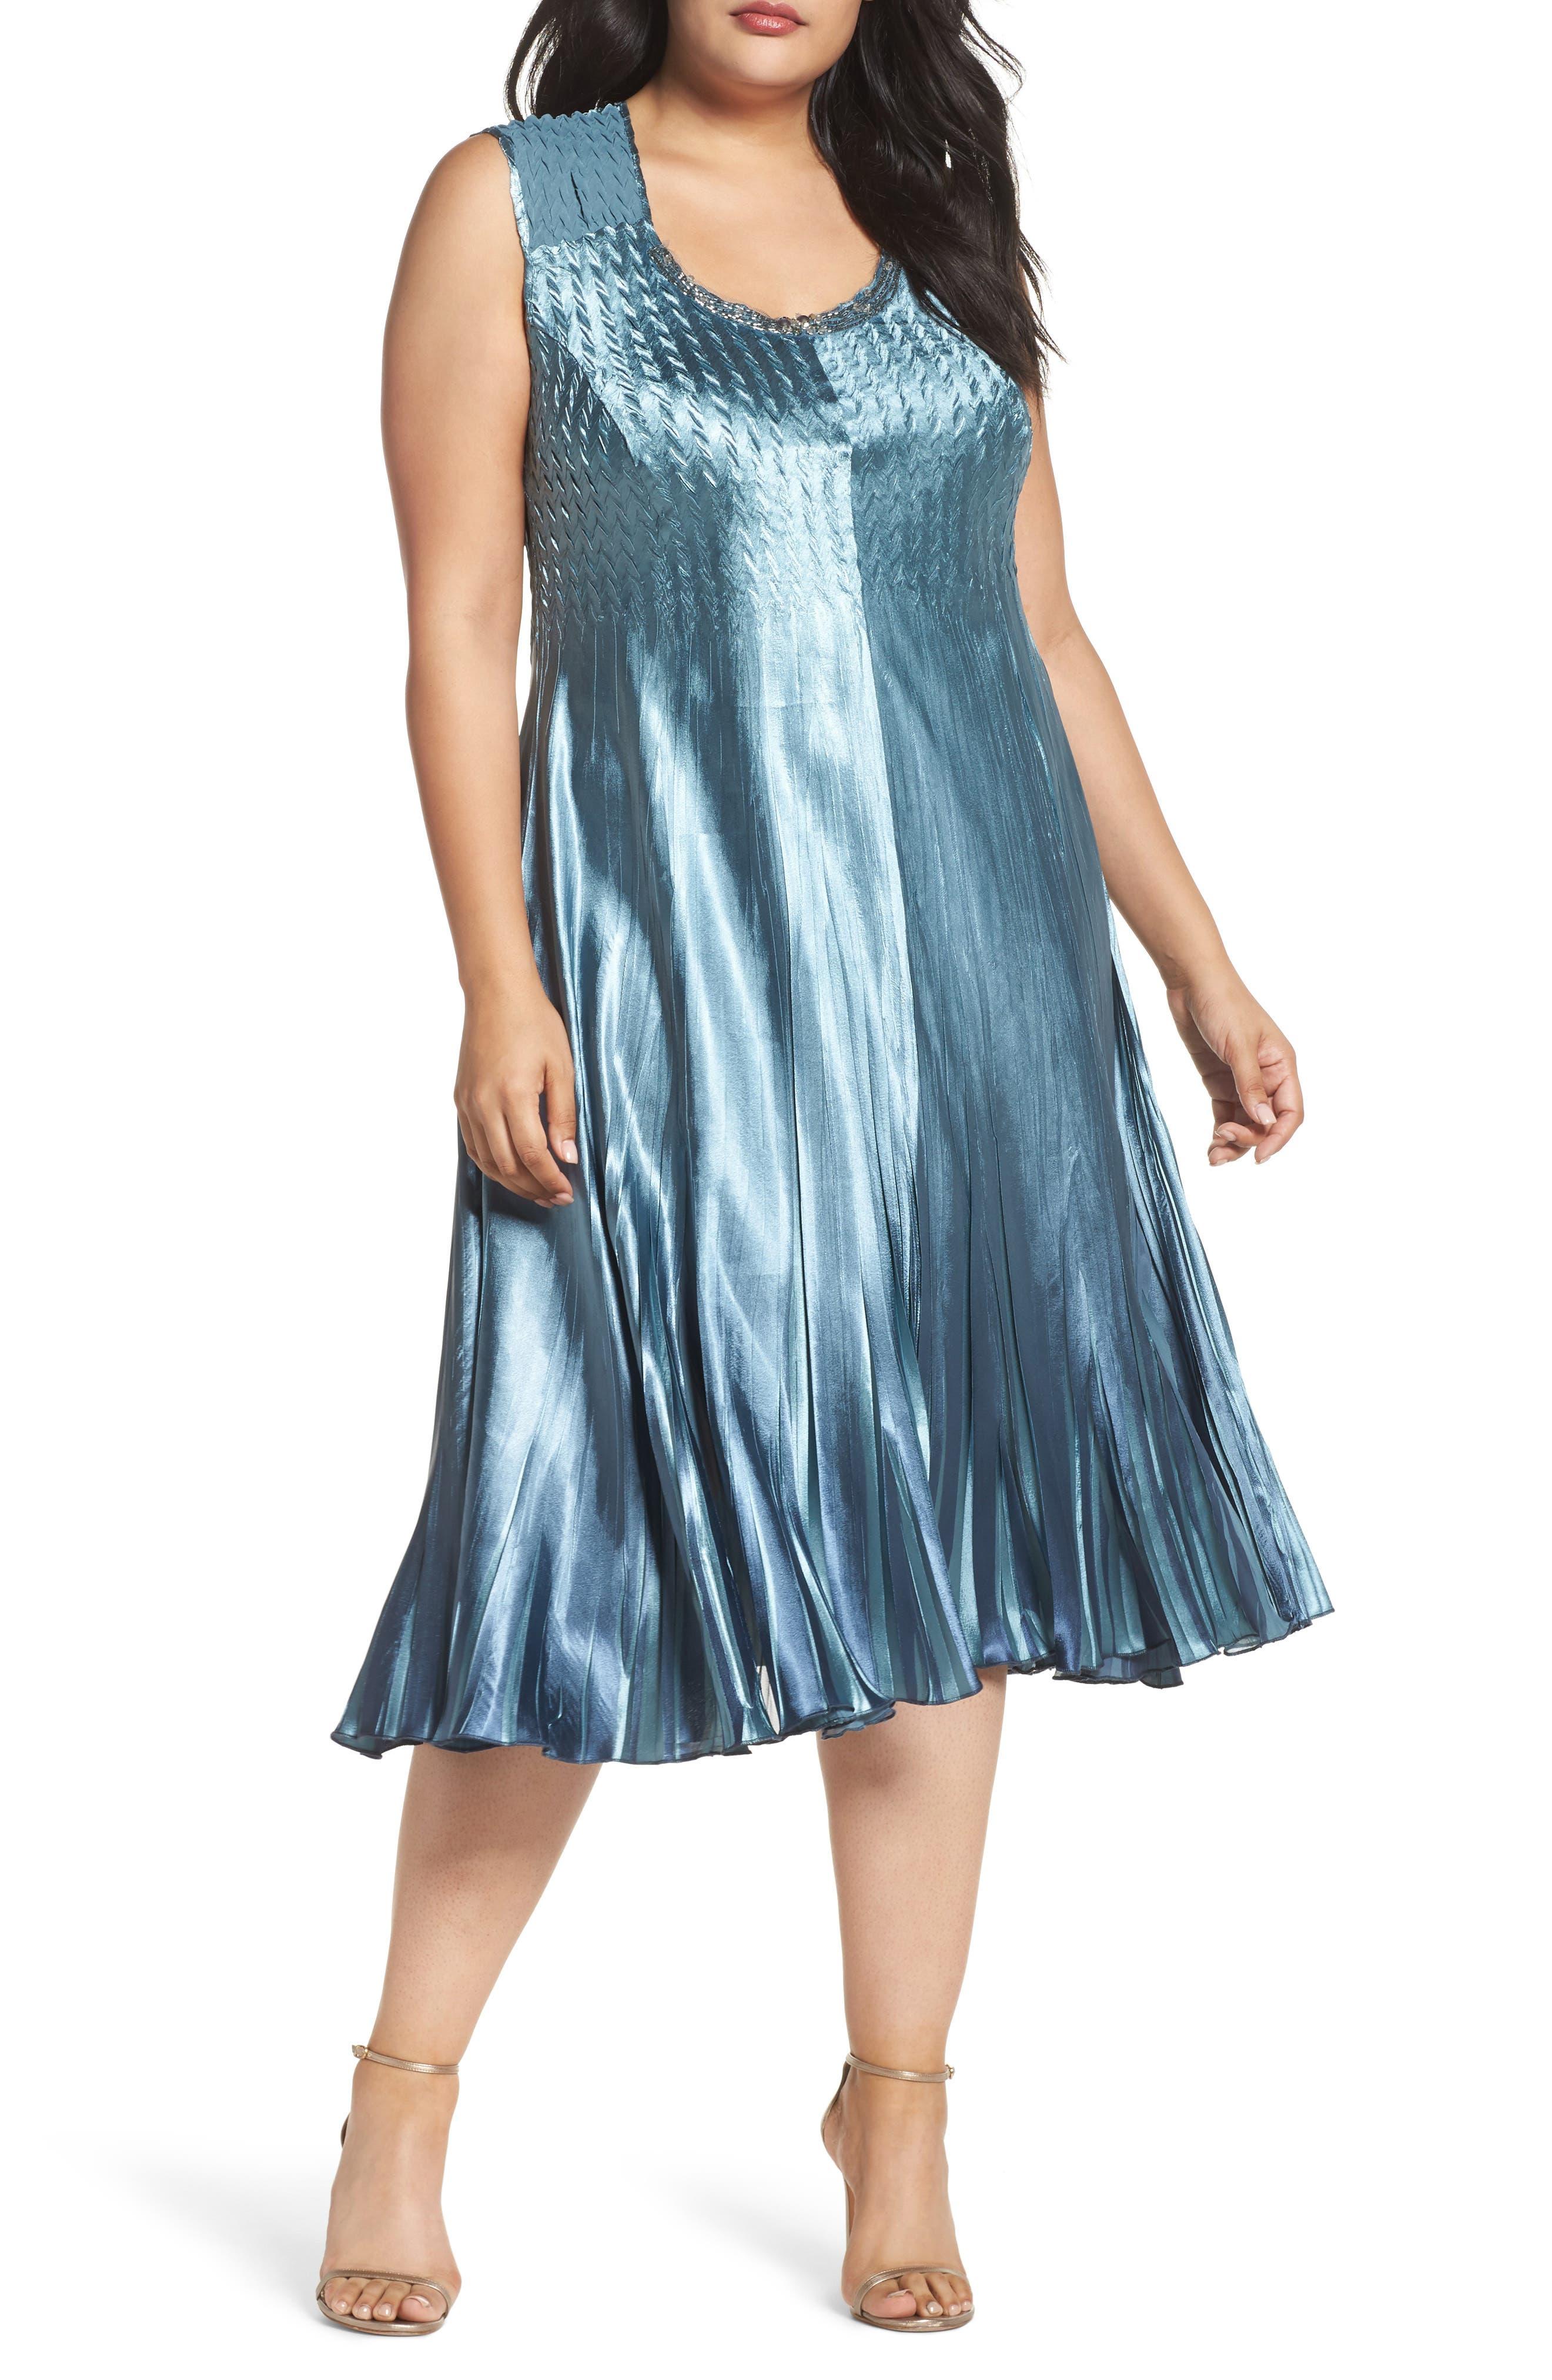 Embellished Charmeuse & Chiffon Dress with Jacket,                             Alternate thumbnail 3, color,                             460